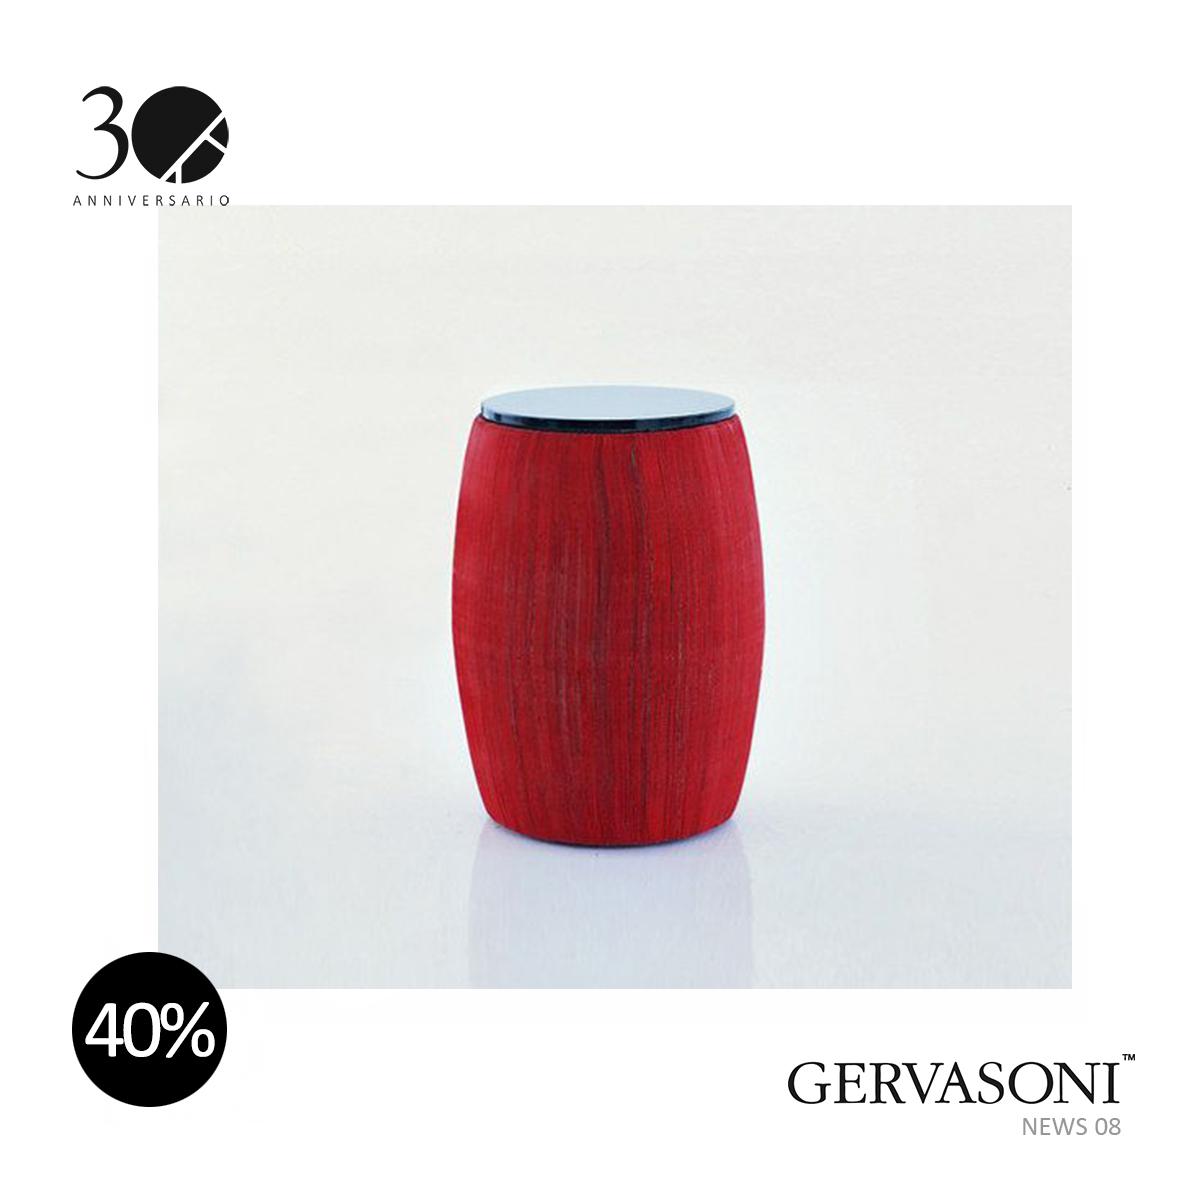 GERVASONI - NEWS 08